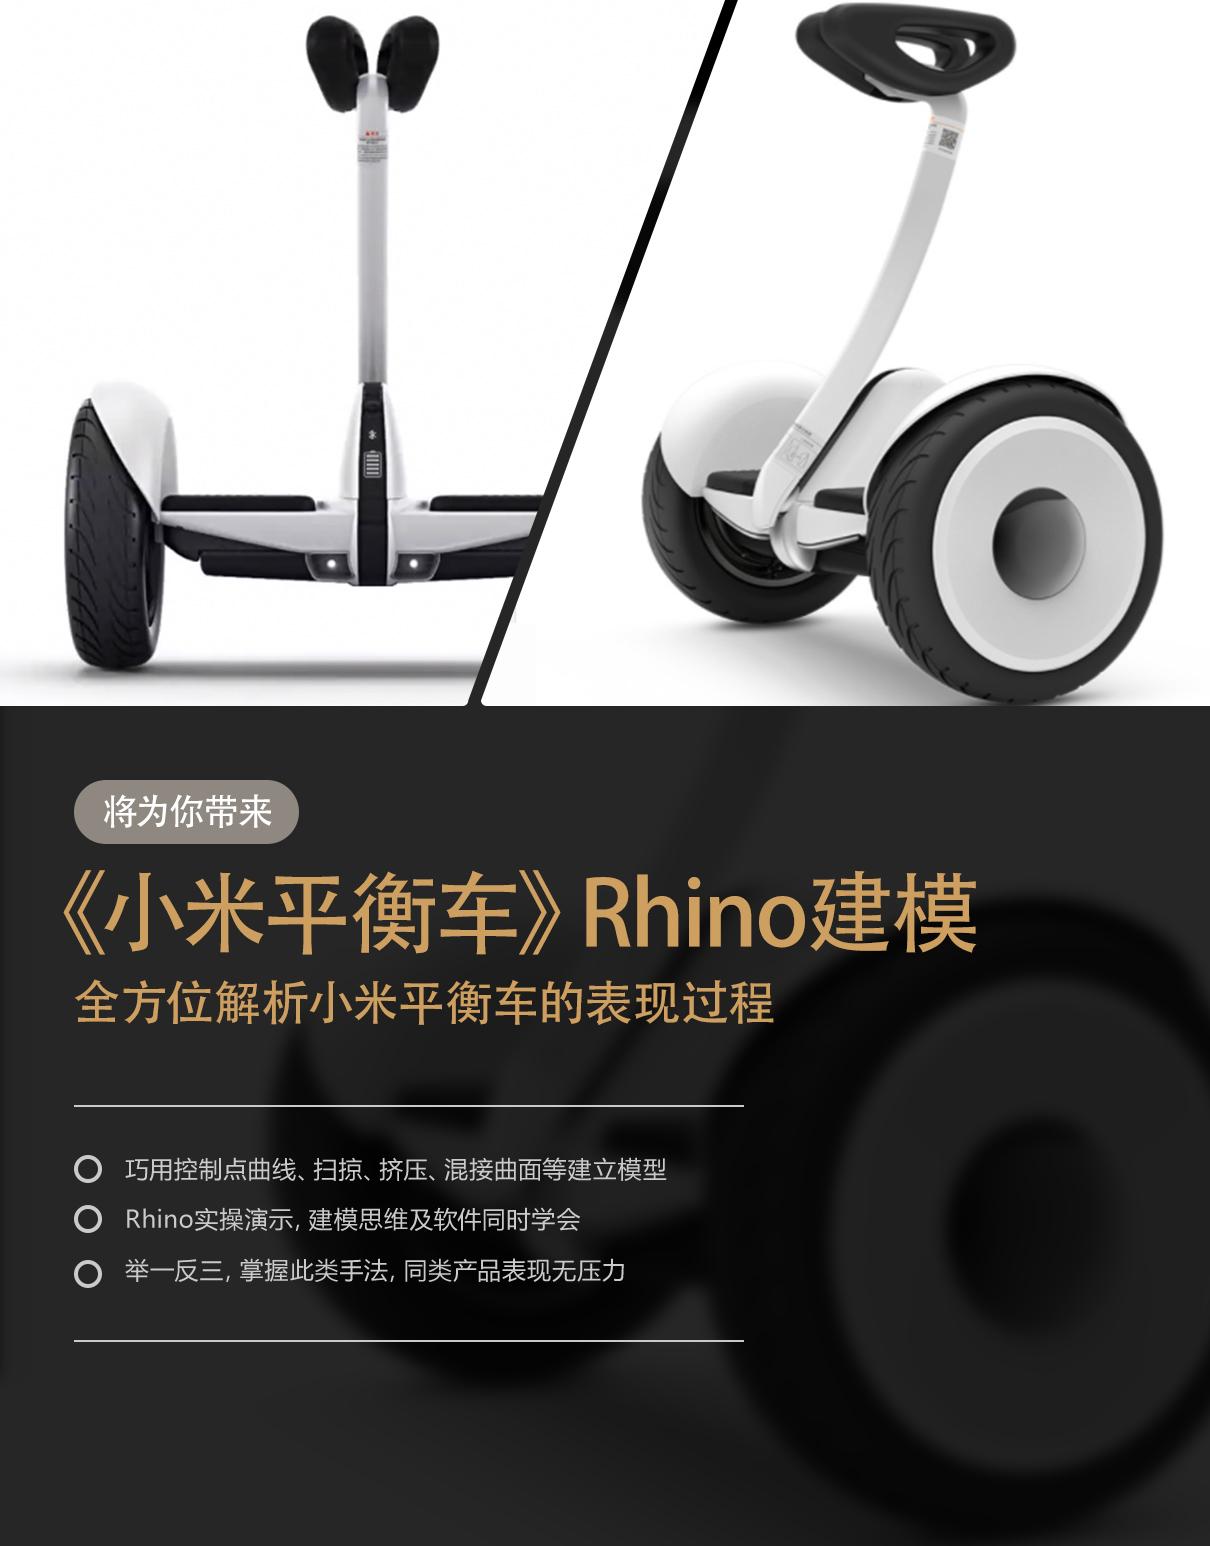 Rhino高级建模